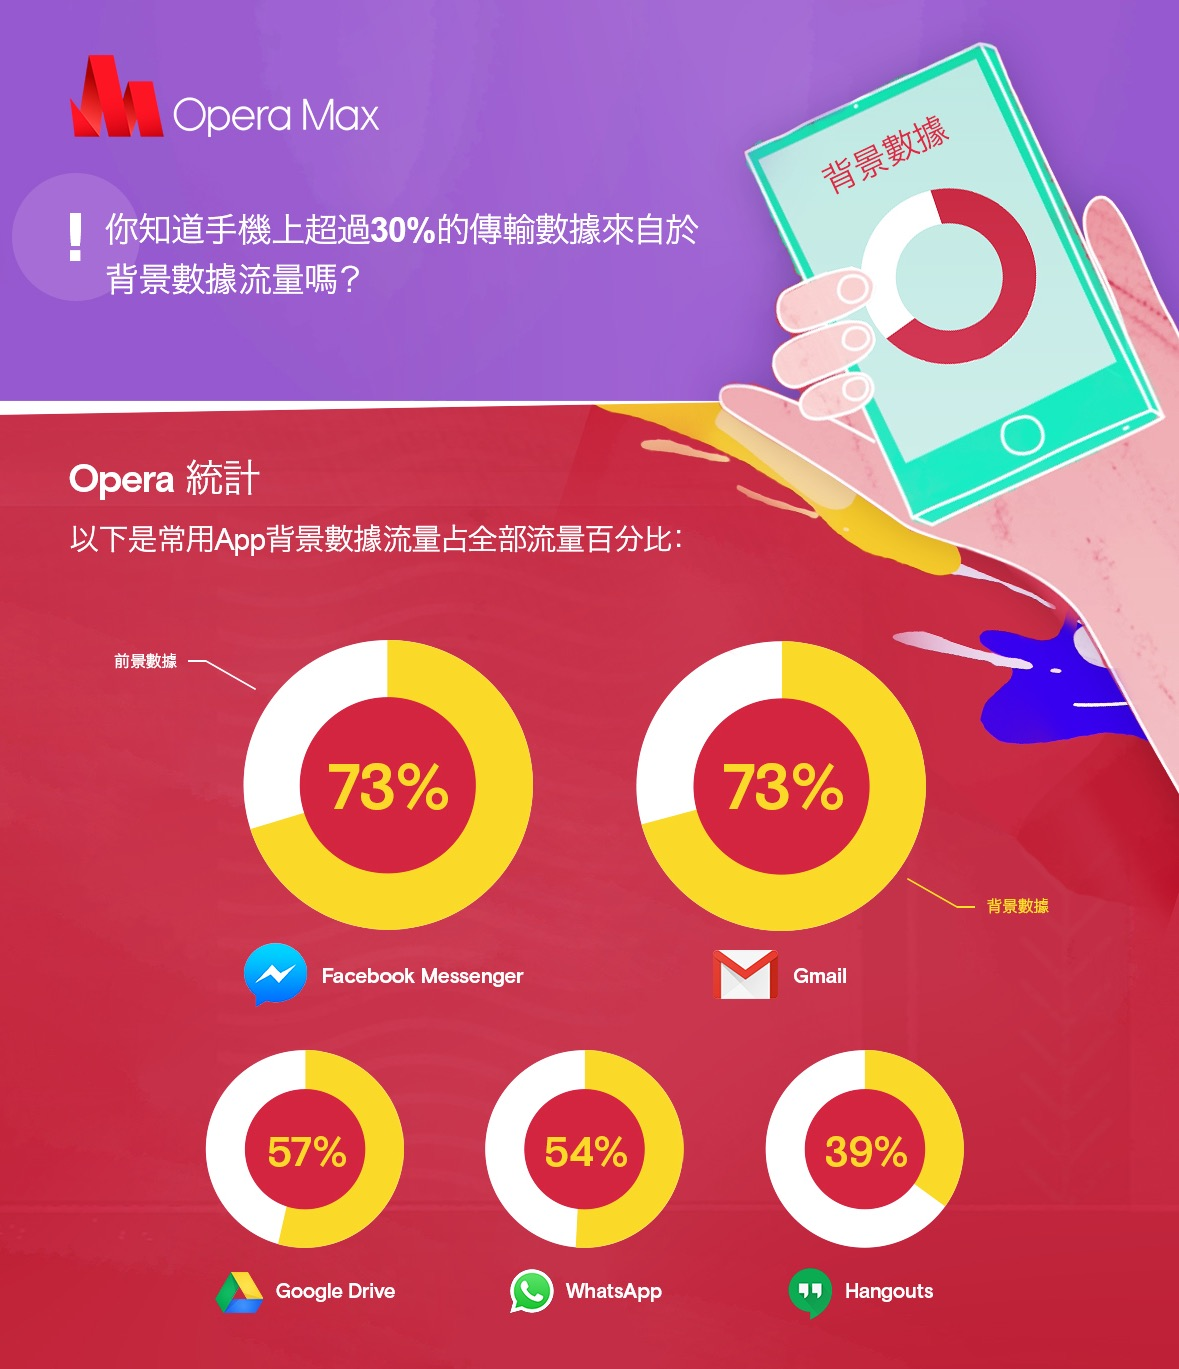 Thumbnail for '統計:手機App背景數據流量高達30%'